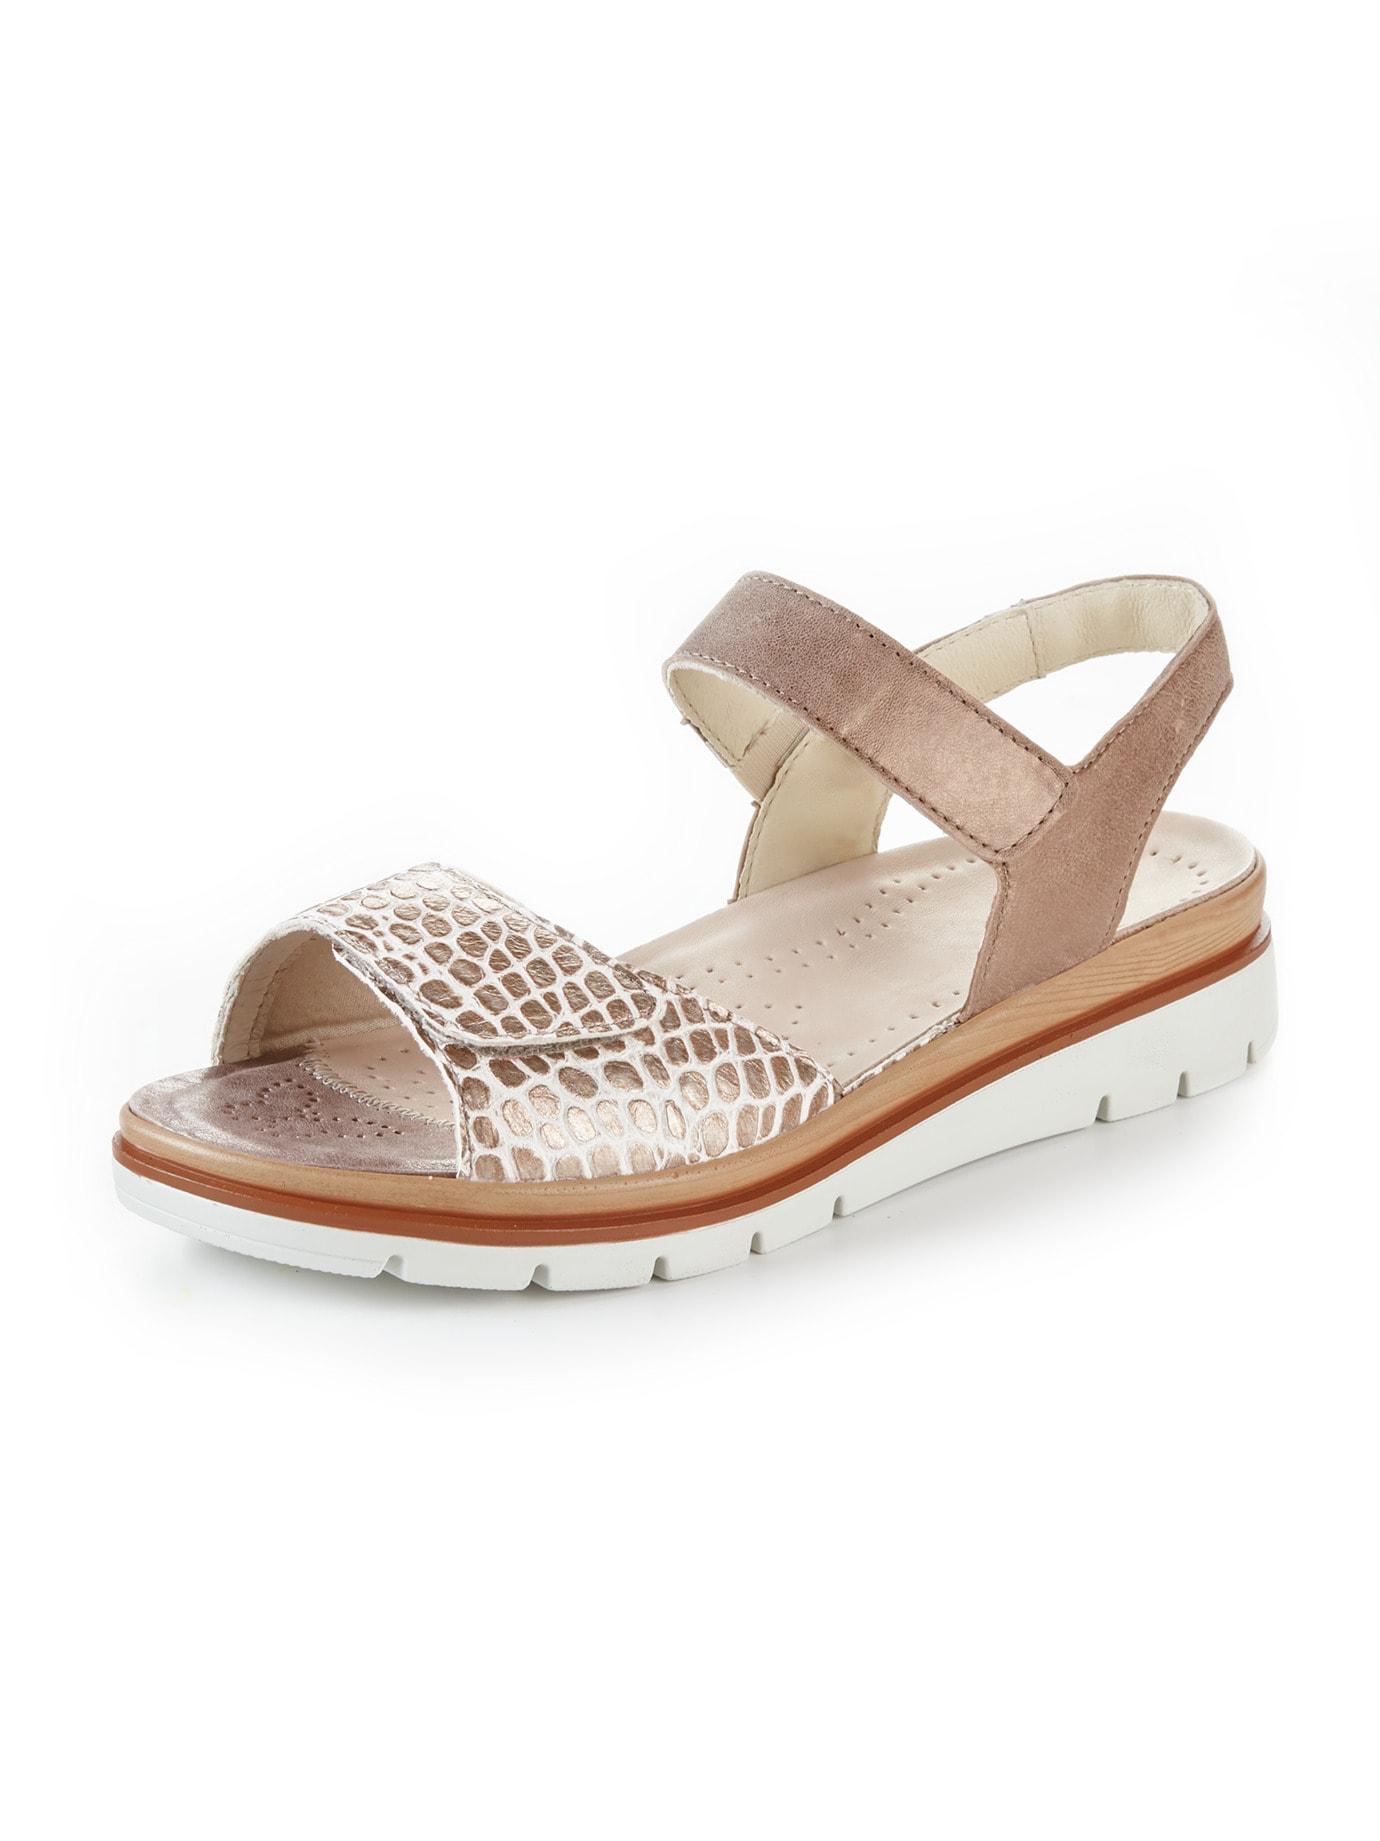 Avena Damen Hallux-Sandale De Luxe Braun 45-8115-6